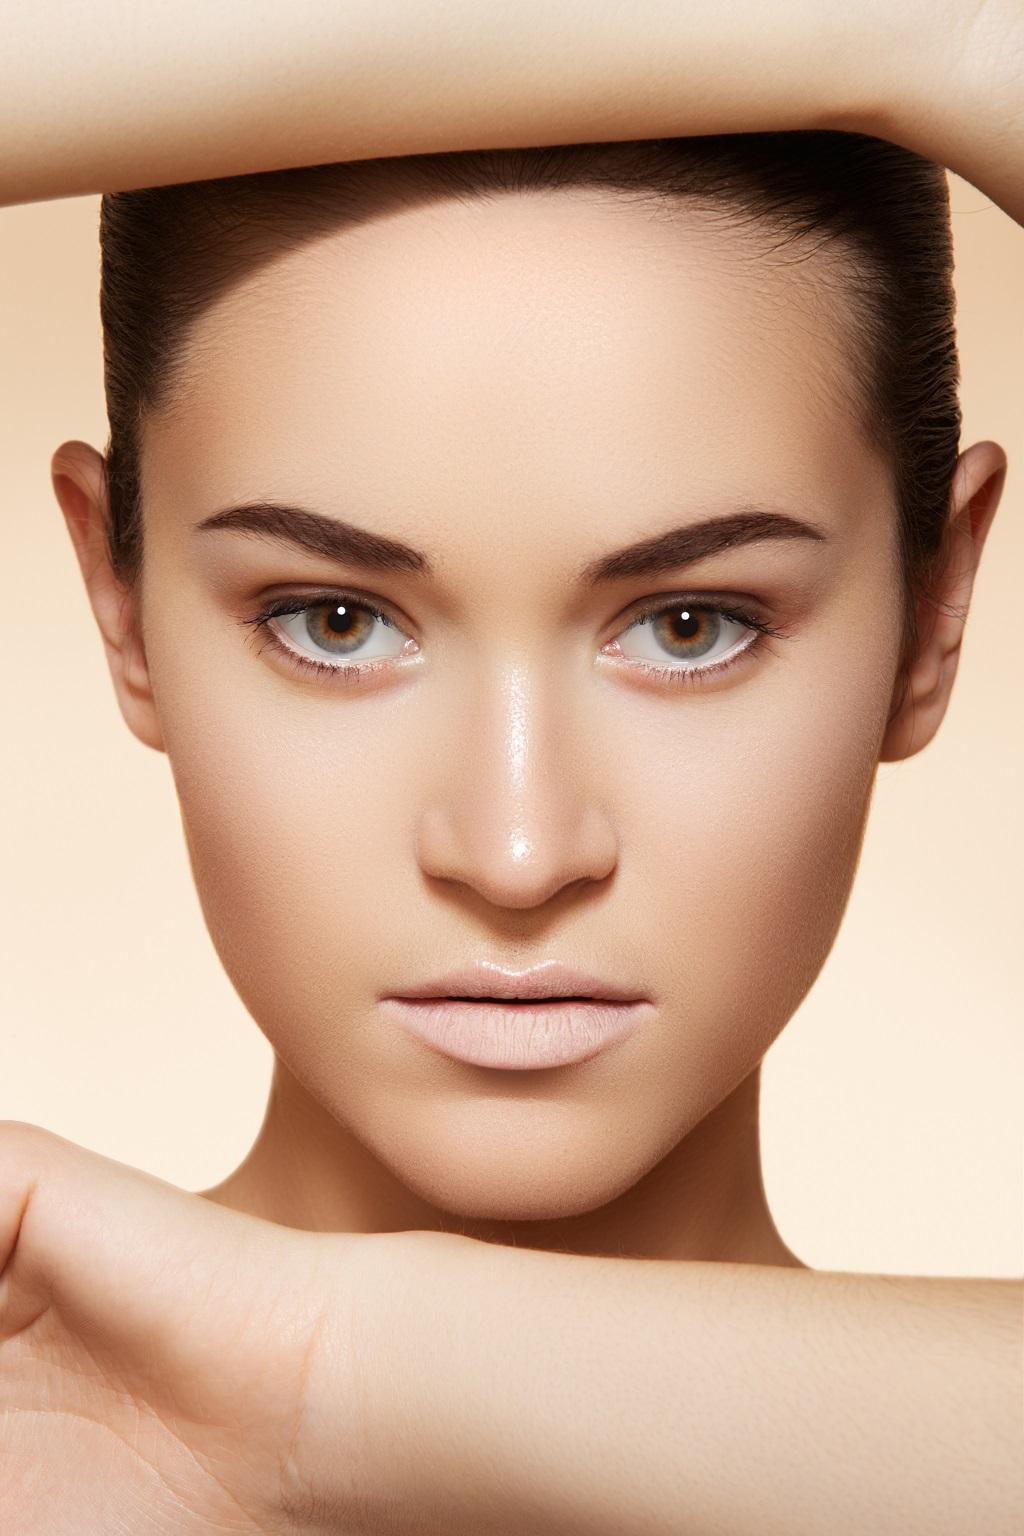 skóra twarzy bez zmarszczek